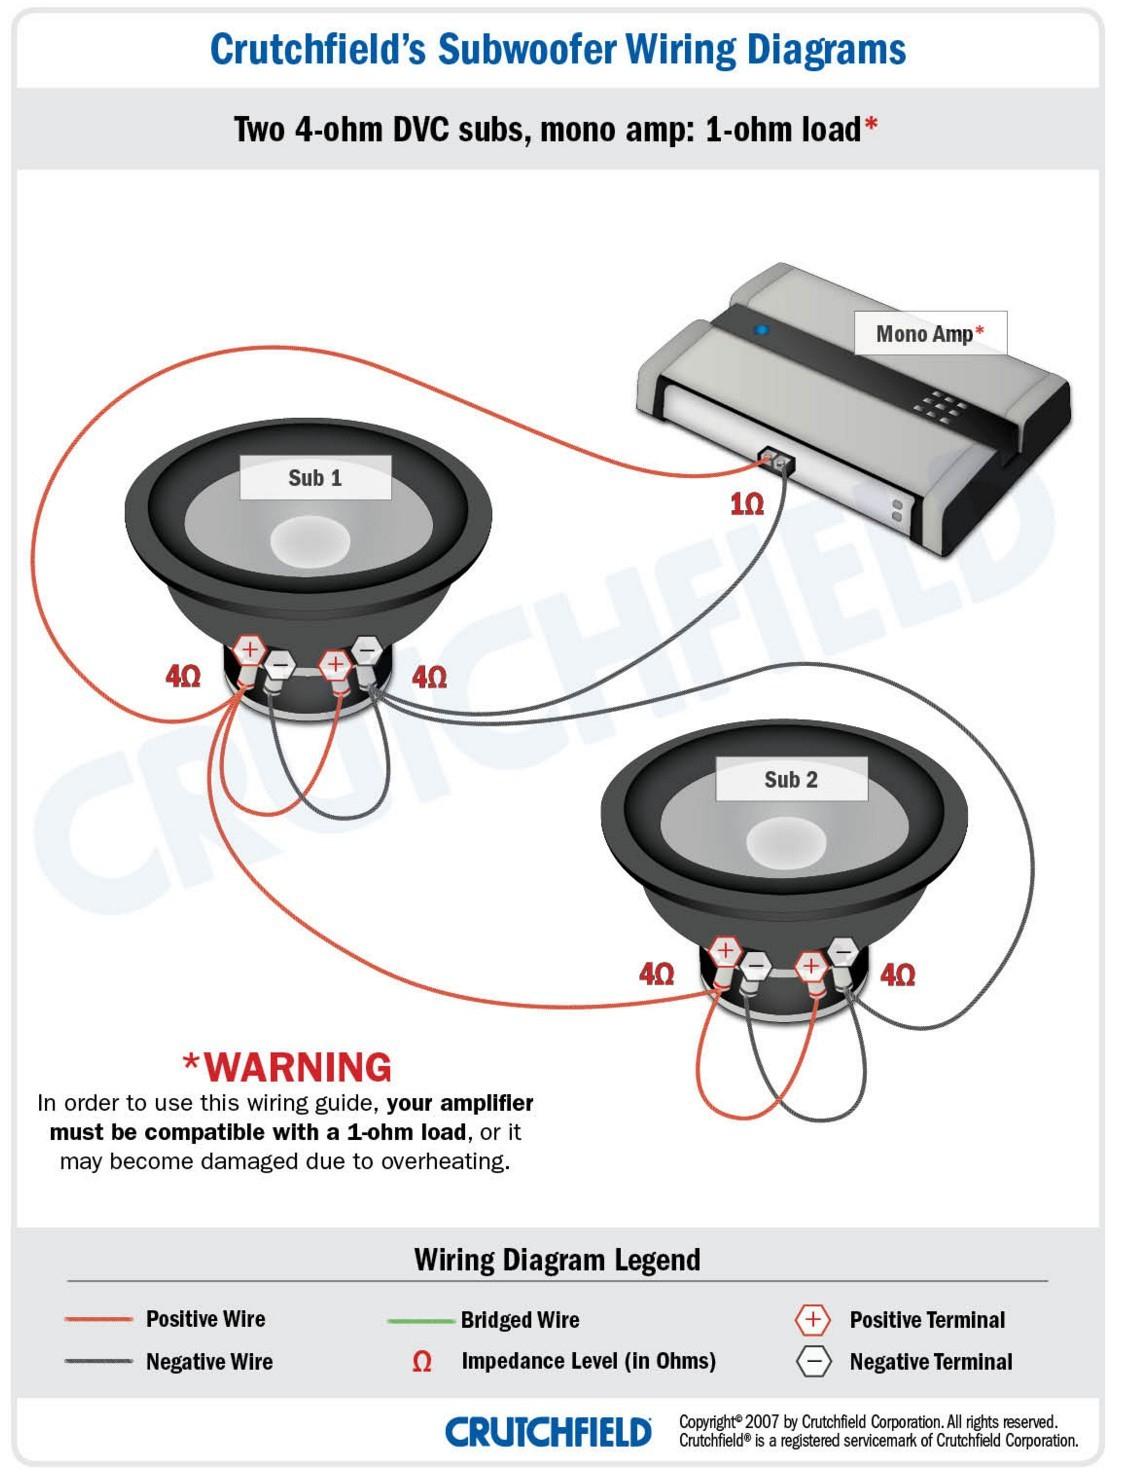 Crutchfield Sub Amp Wiring Diagrams   Wiring Diagram - Crutchfield Wiring Diagram